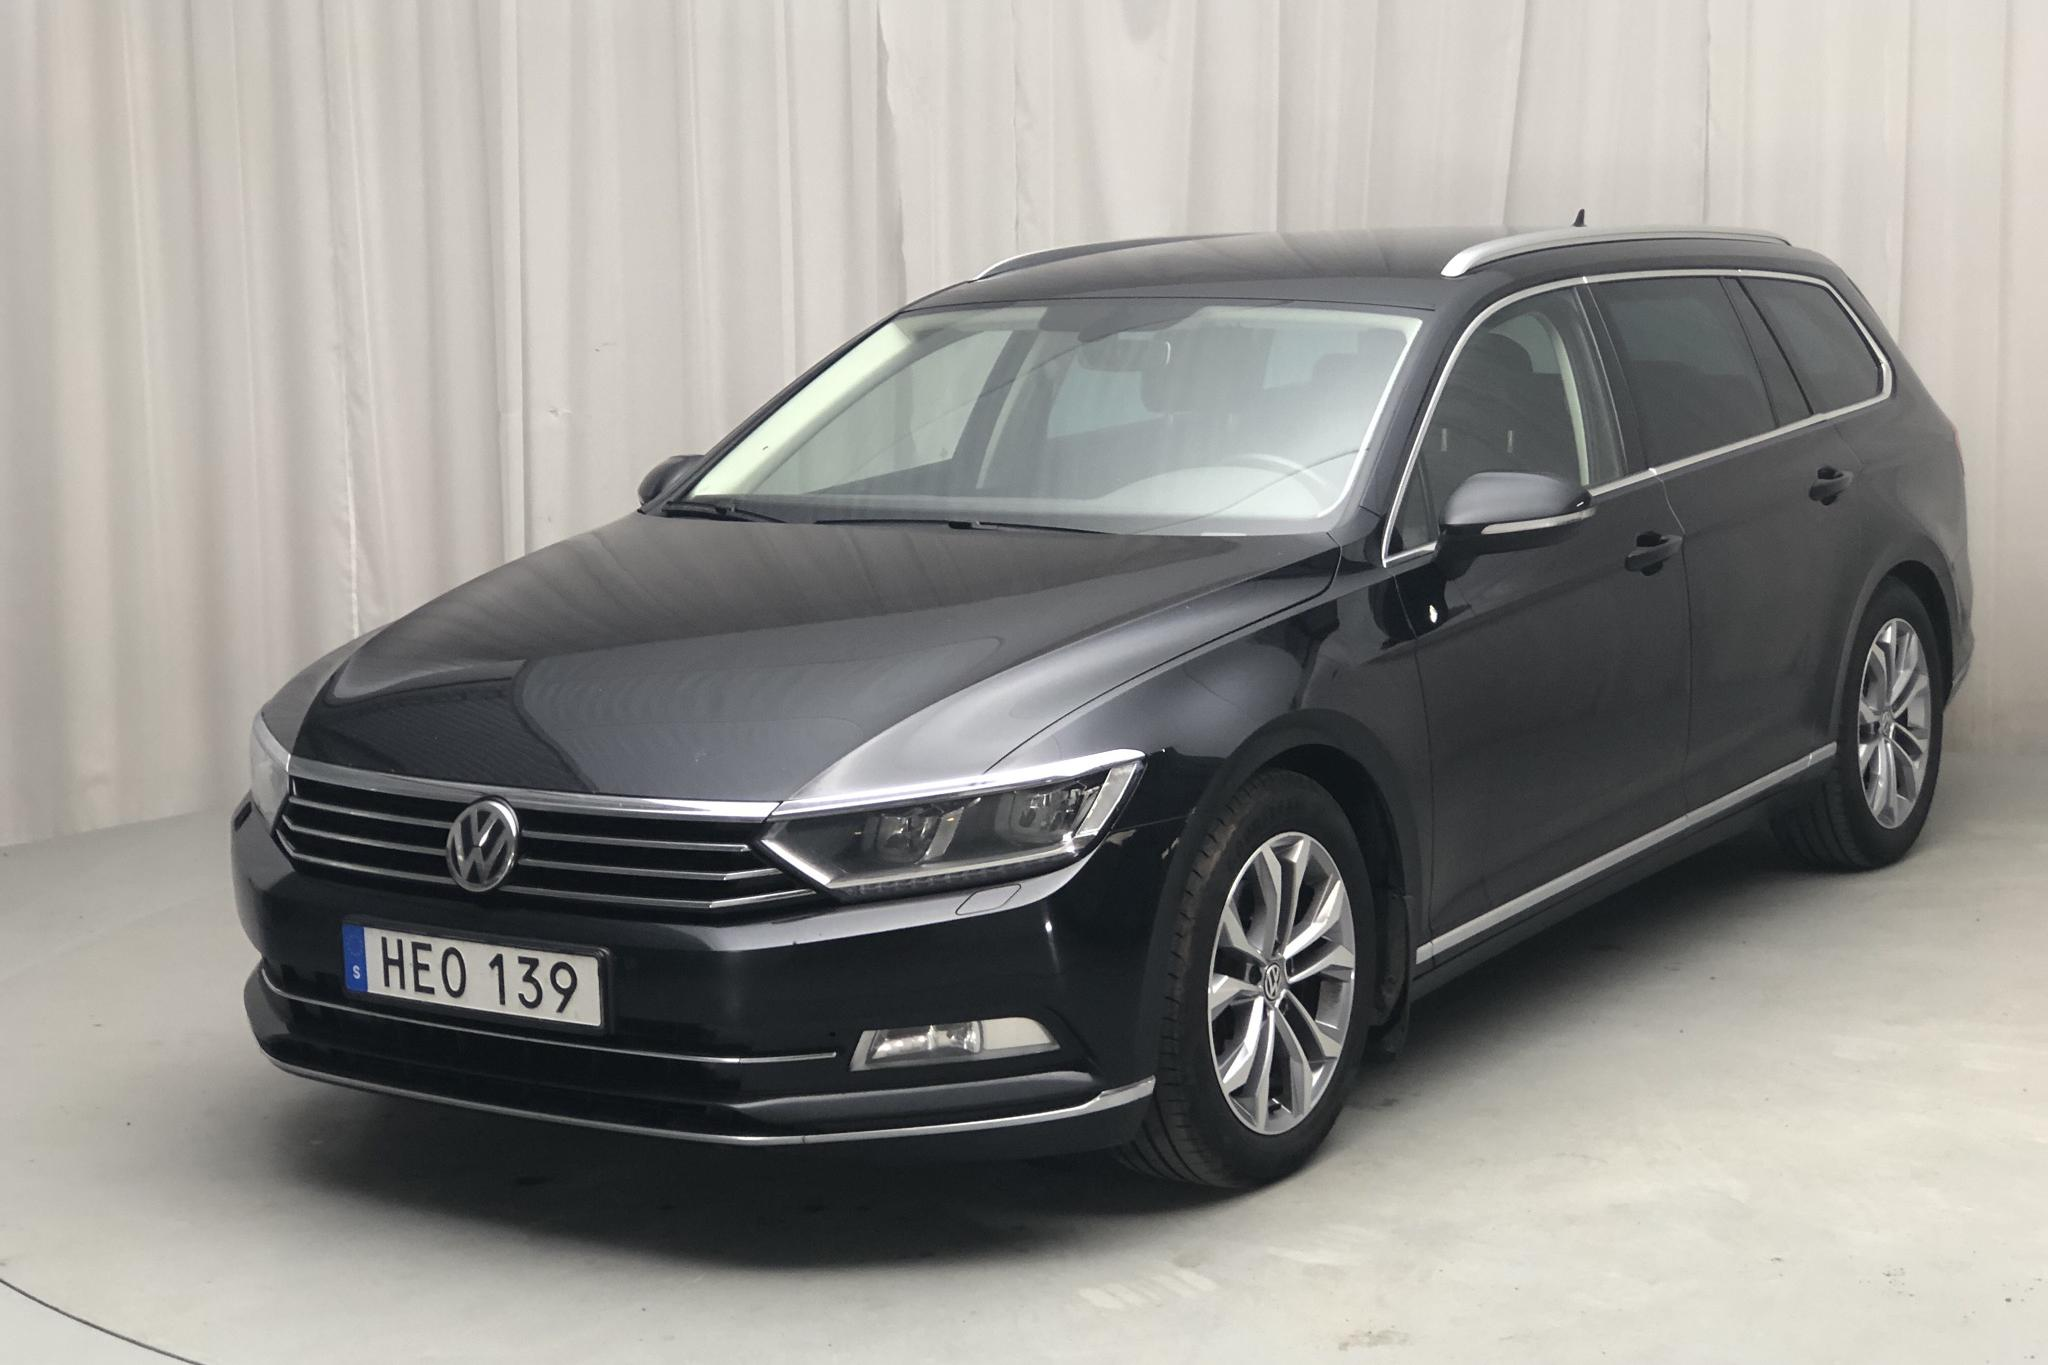 VW Passat 2.0 TDI Sportscombi (190hk) - 187 860 km - Automatic - black - 2015